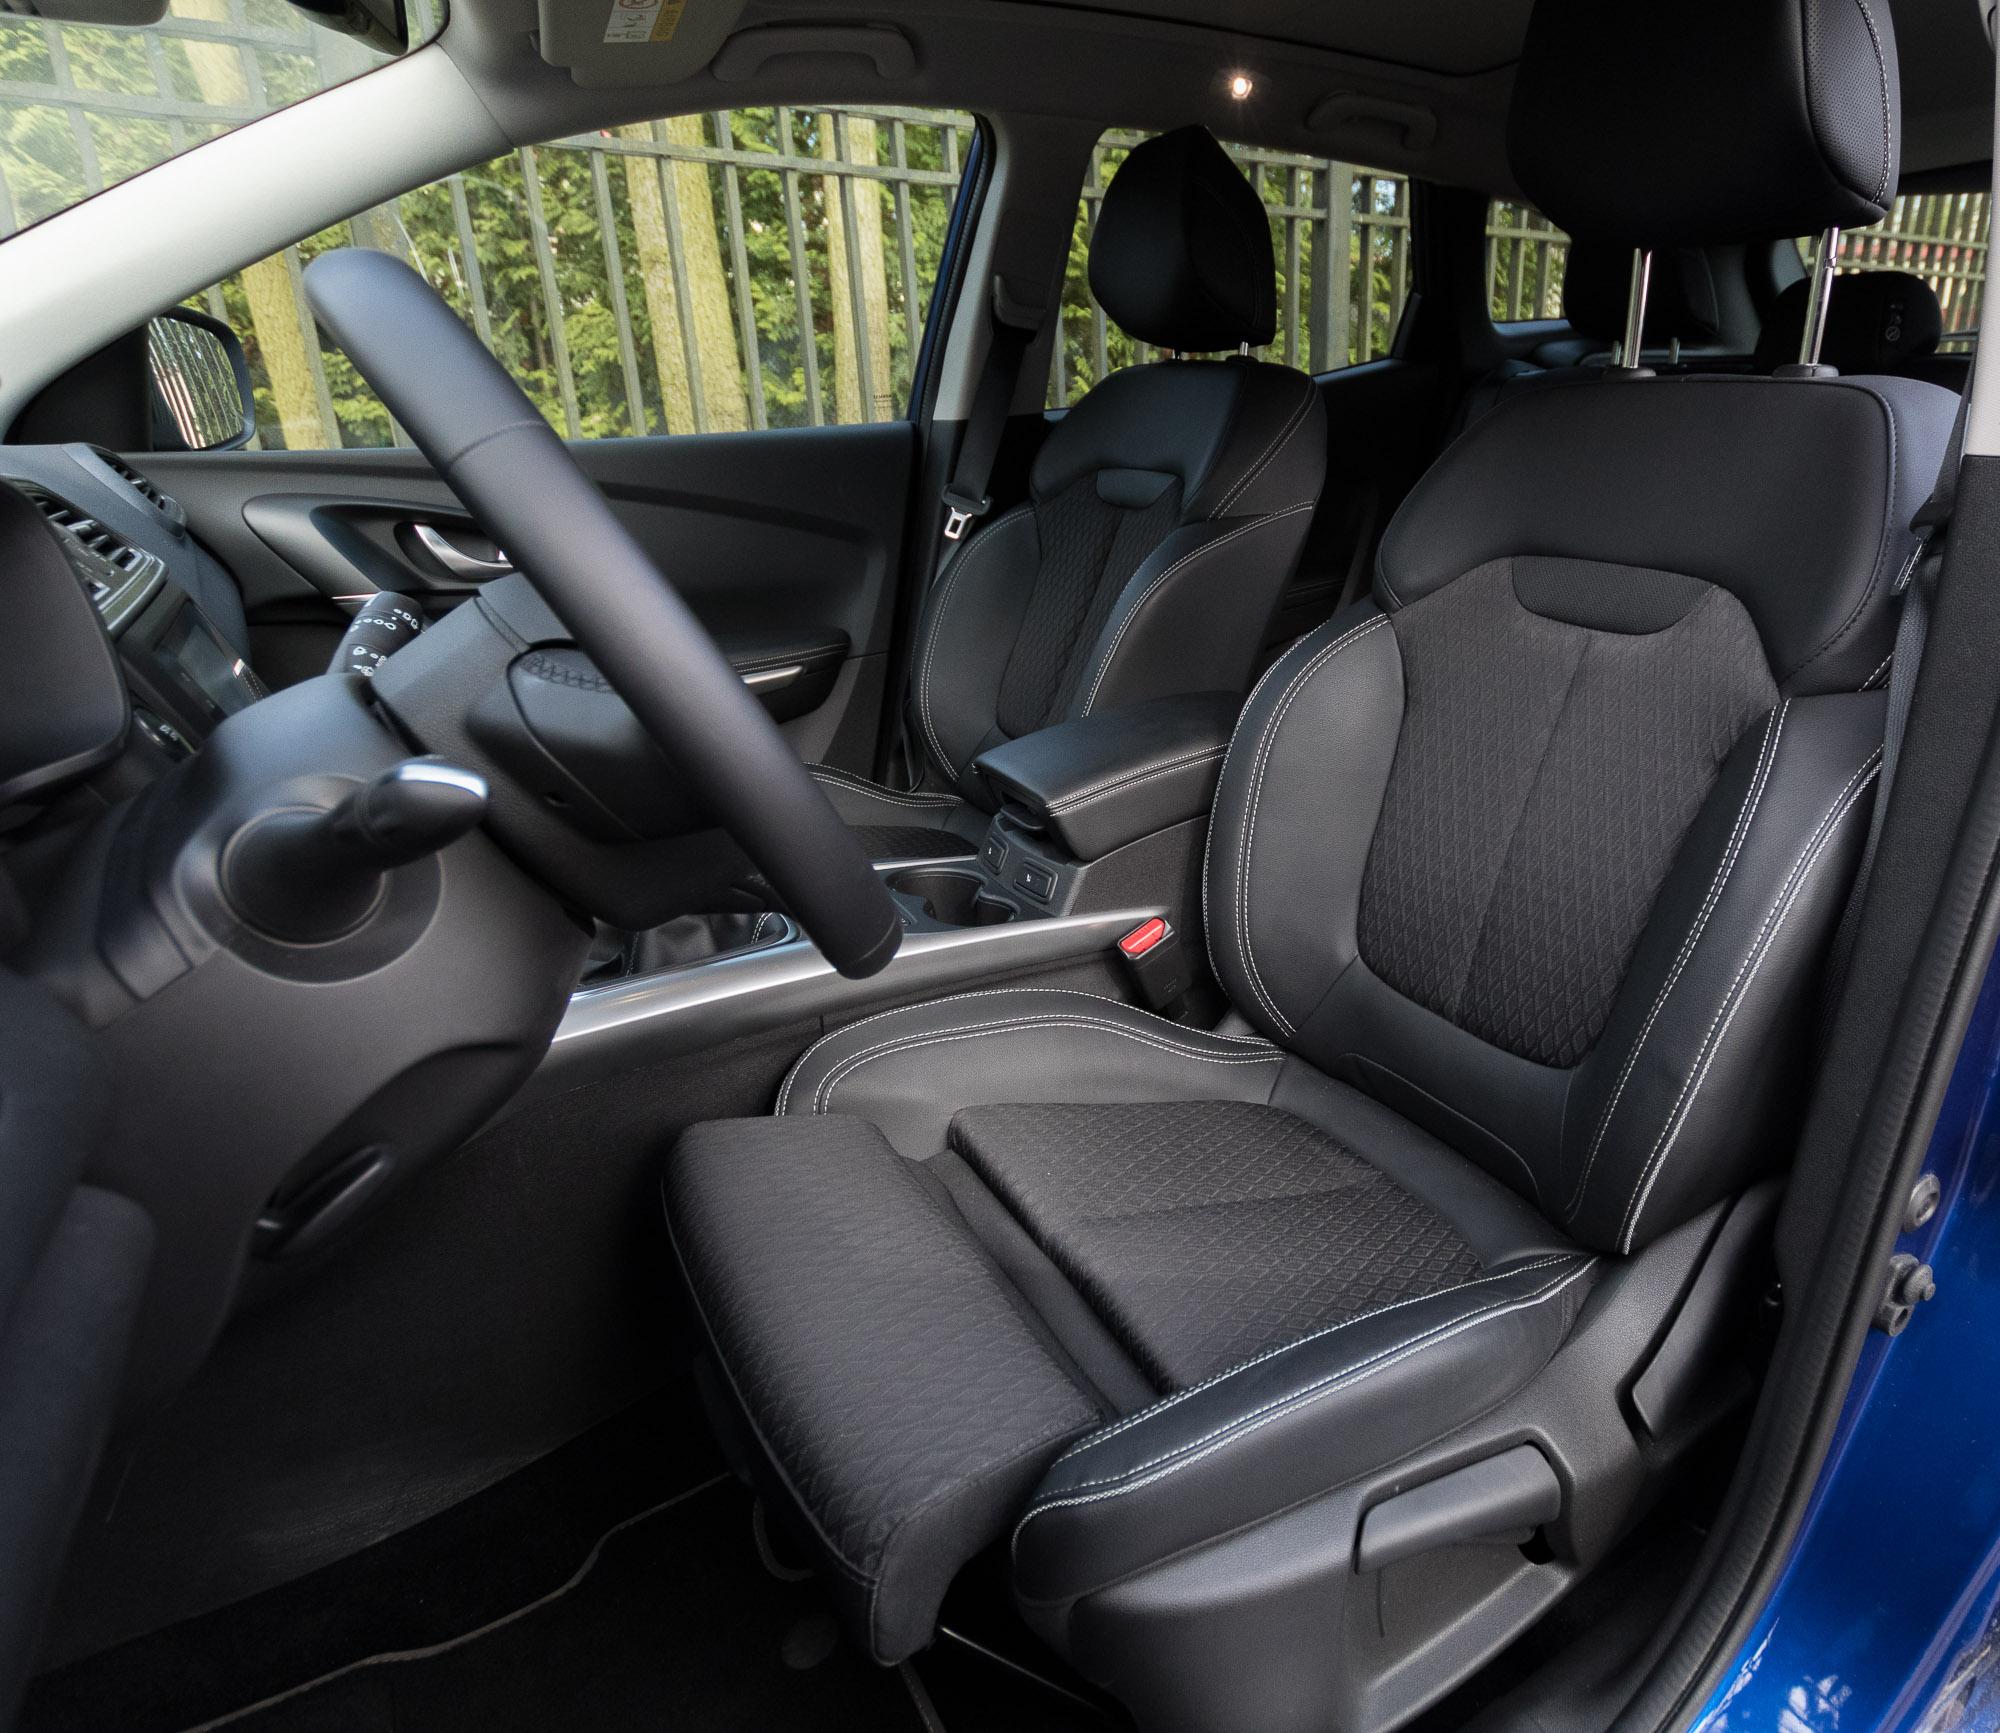 Renault Kadjar 2019 test